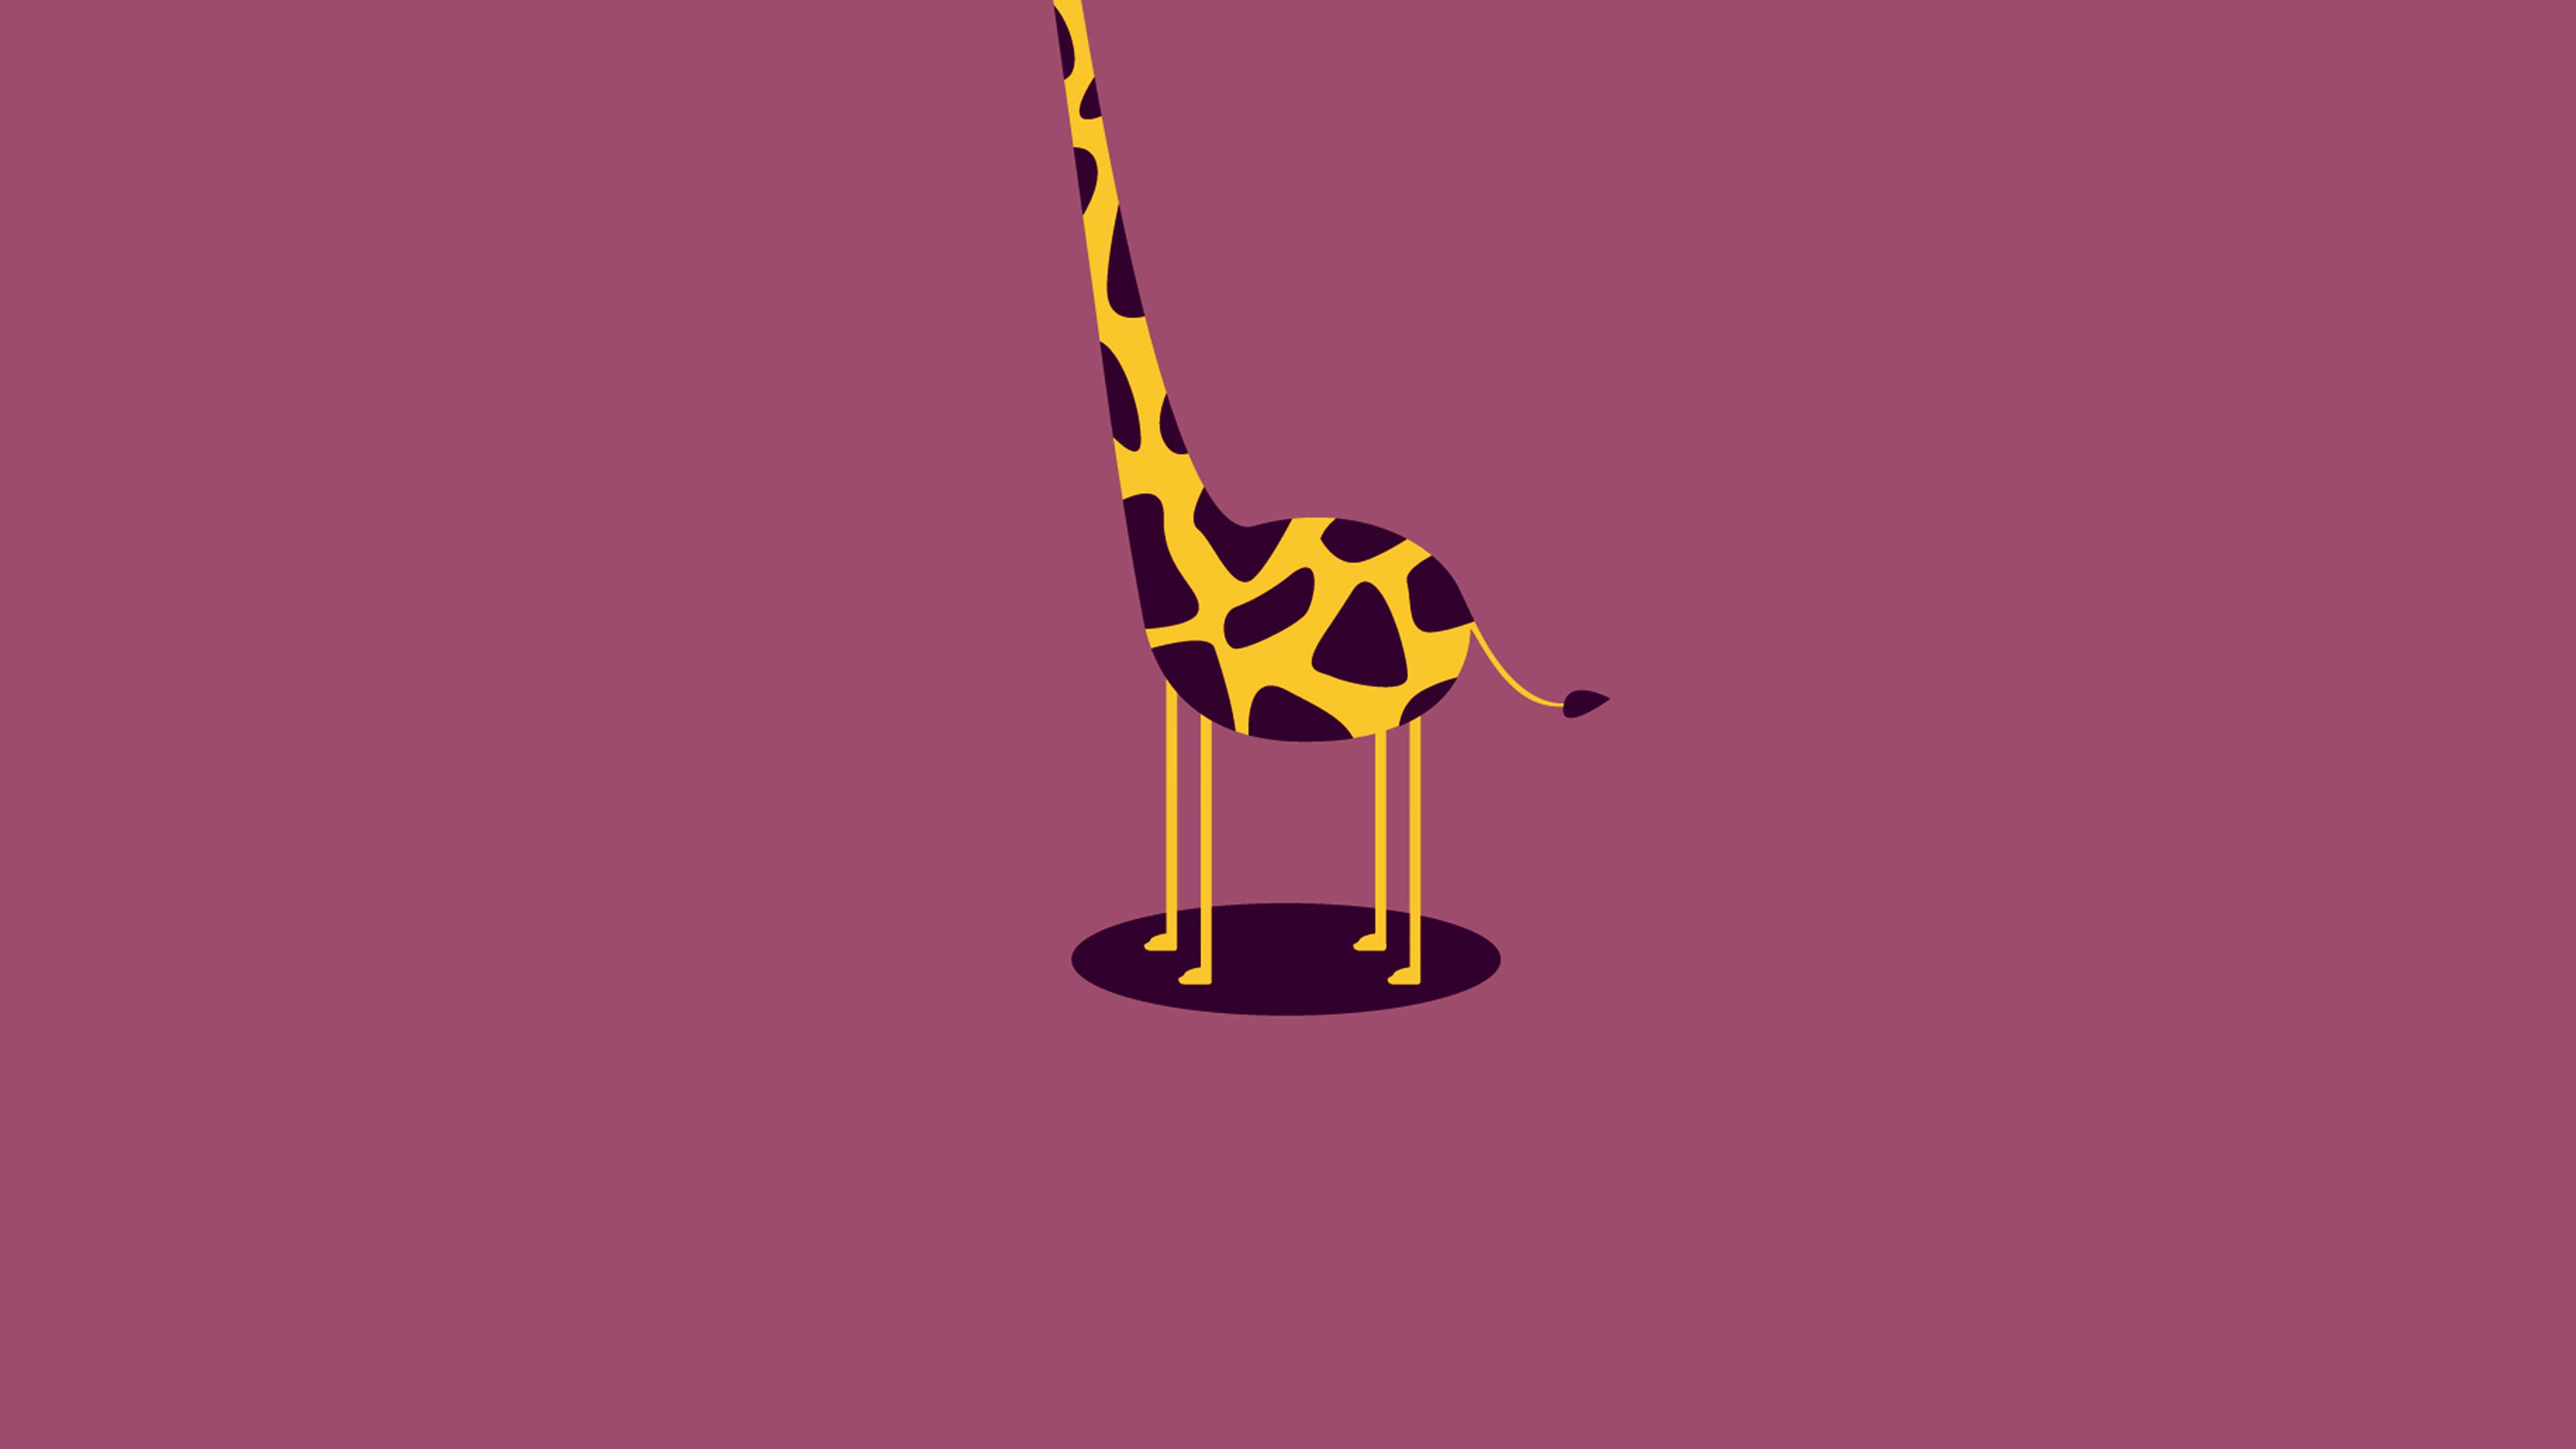 ag51-giraffe-cute-minimal-simple - Papers.co